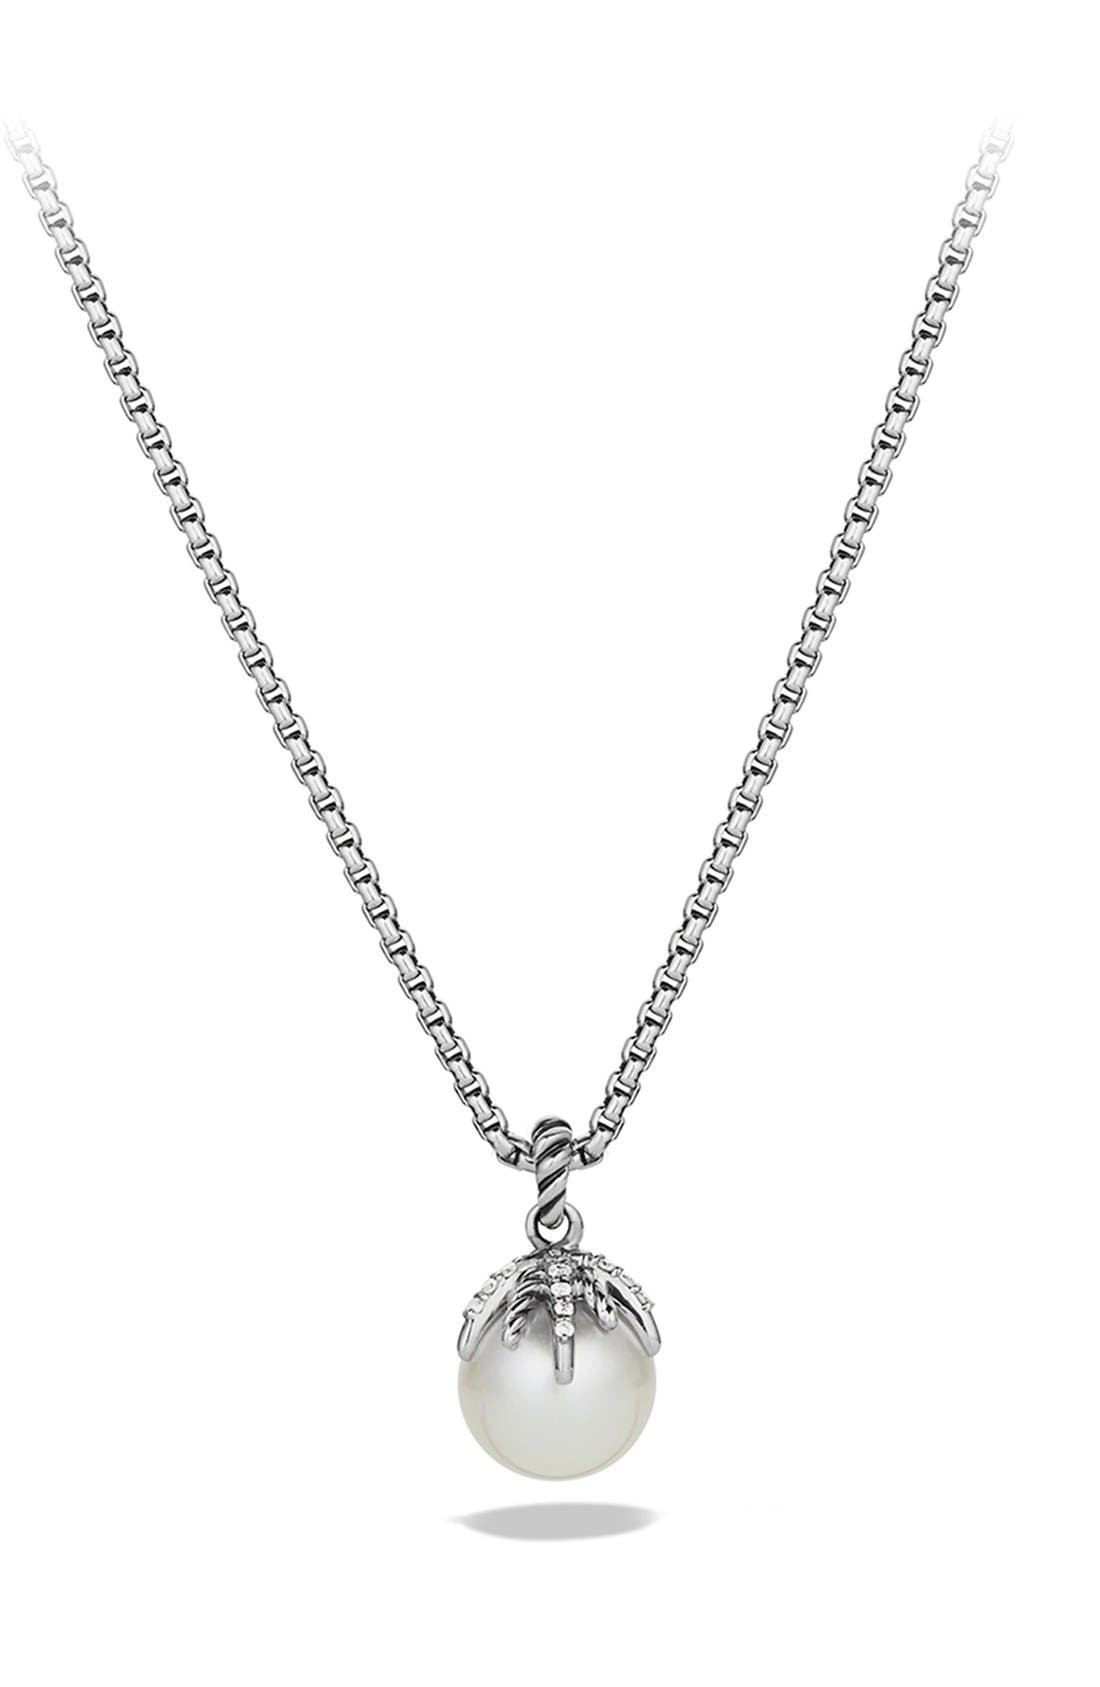 David Yurman 'Starburst' Pearl Pendant with Diamonds on Chain